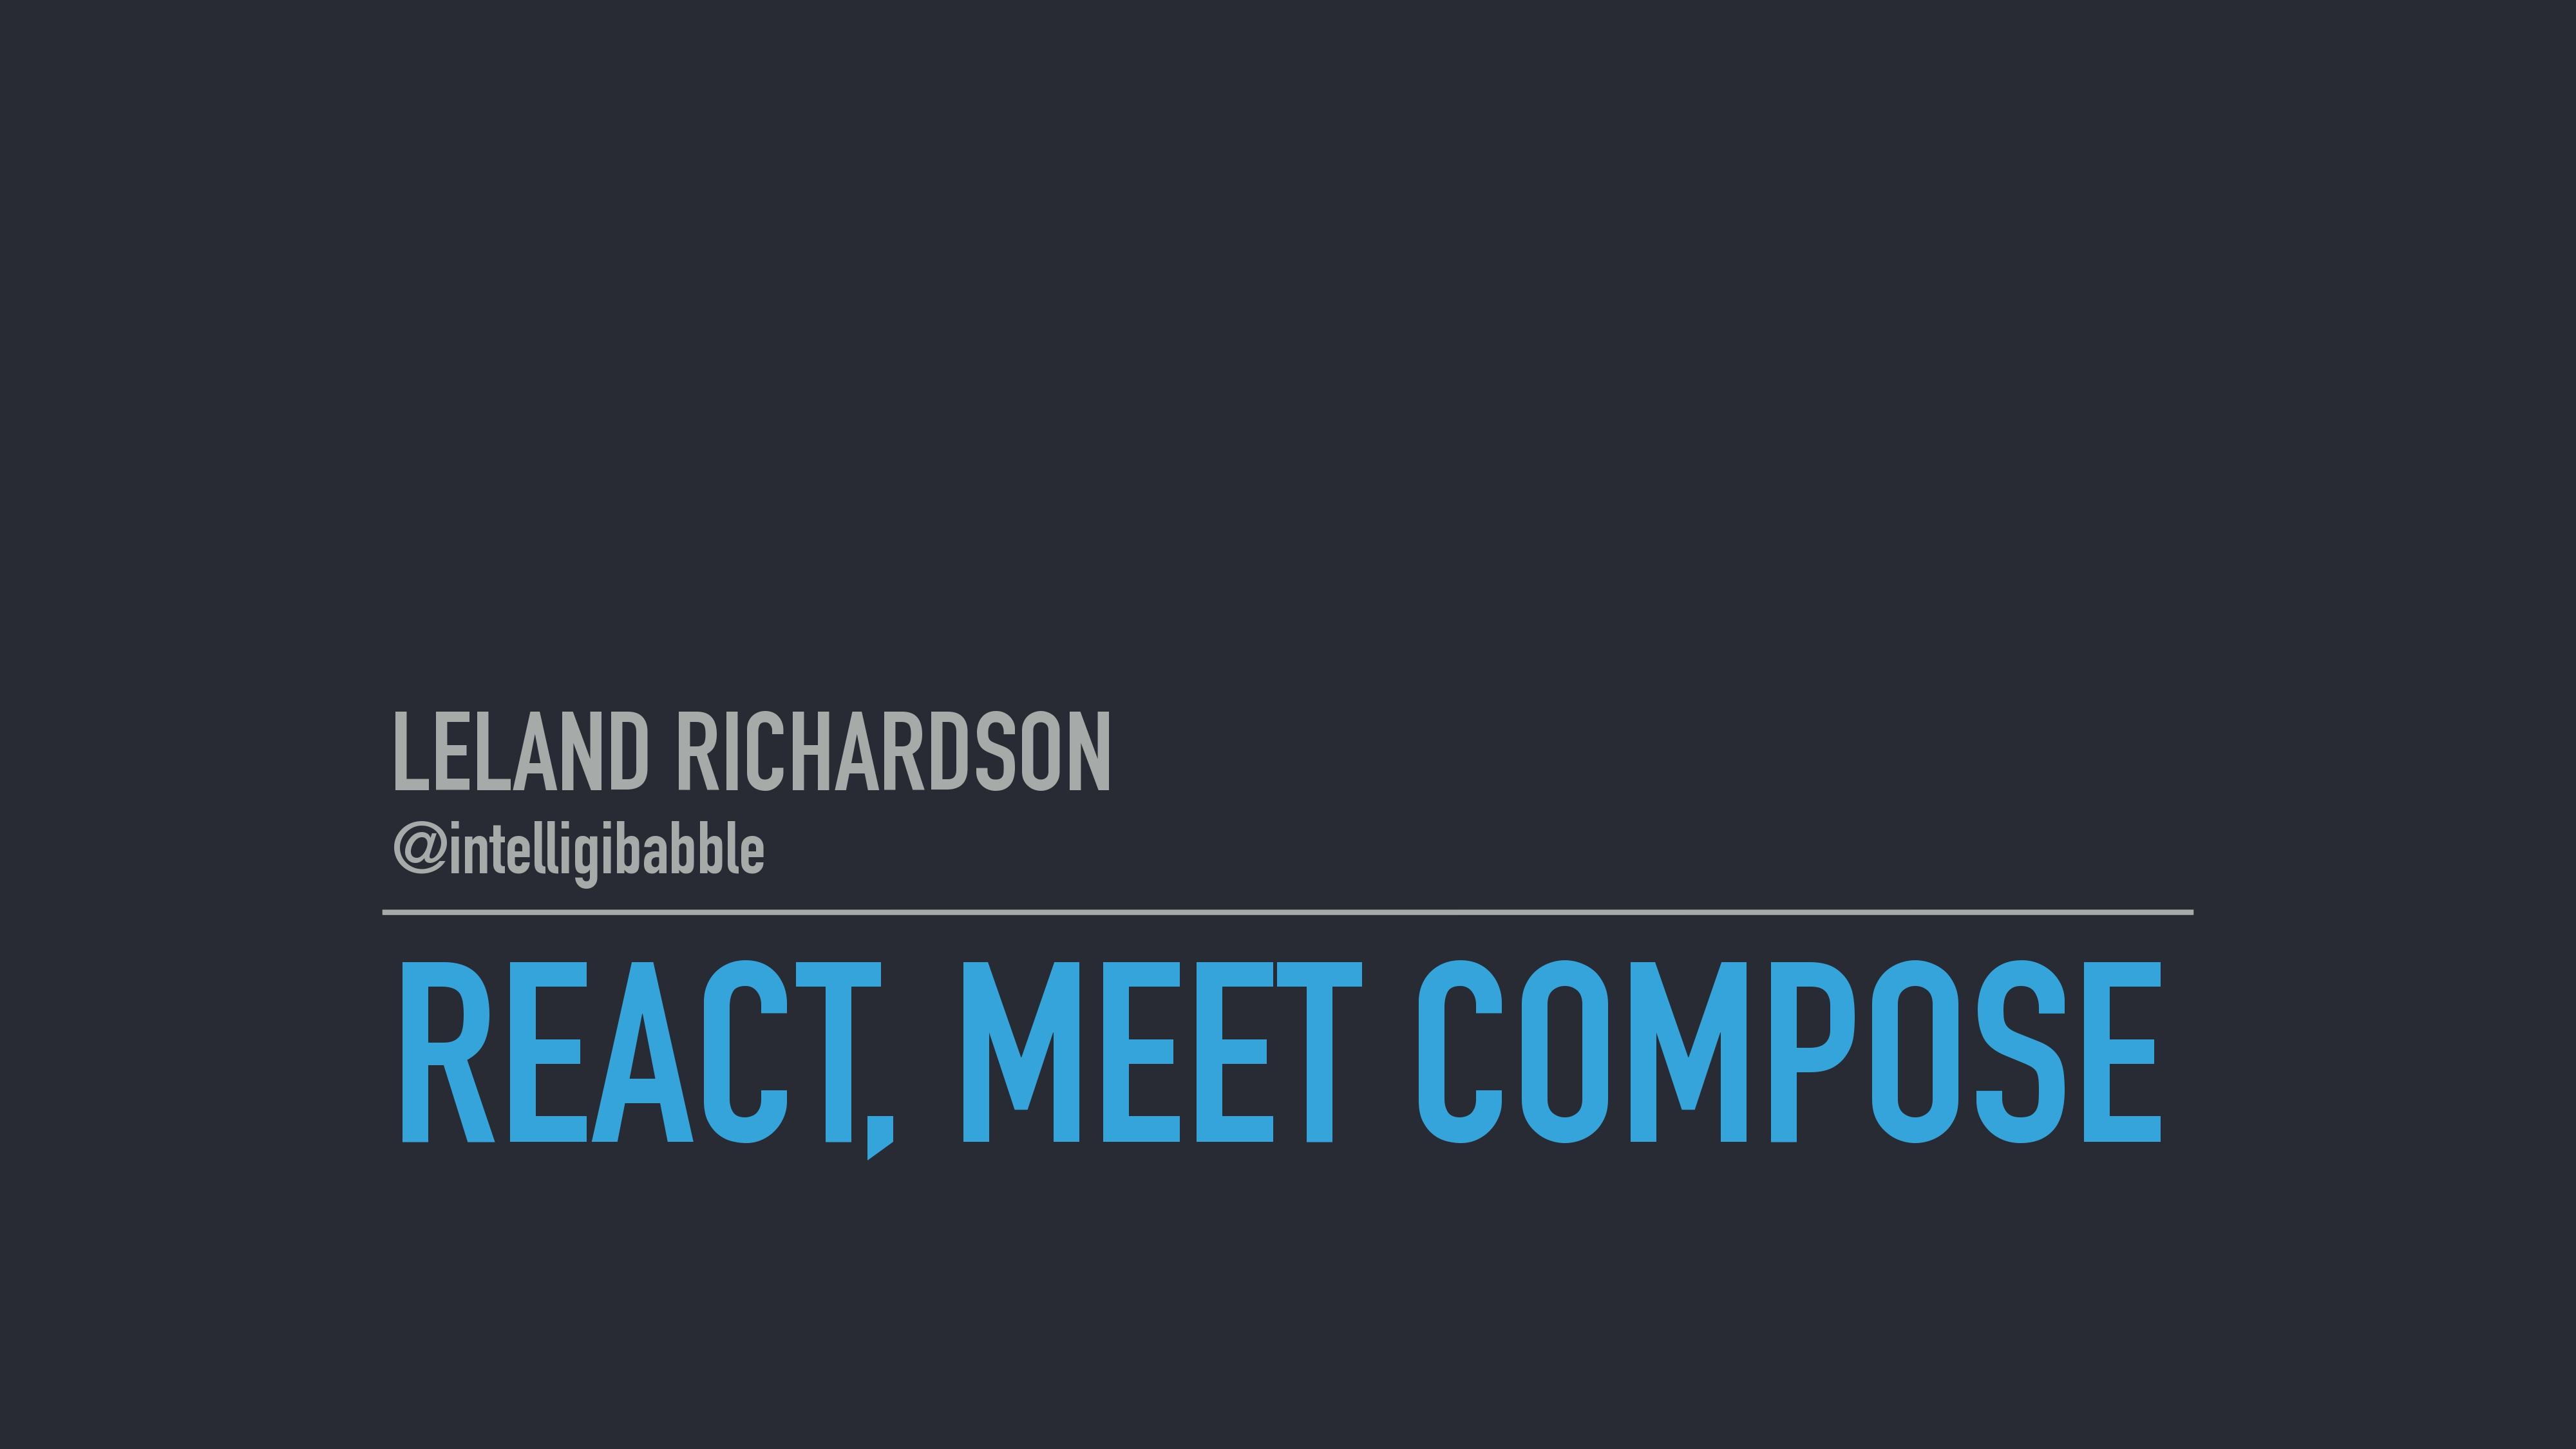 React, Meet Compose by Leland Richardson